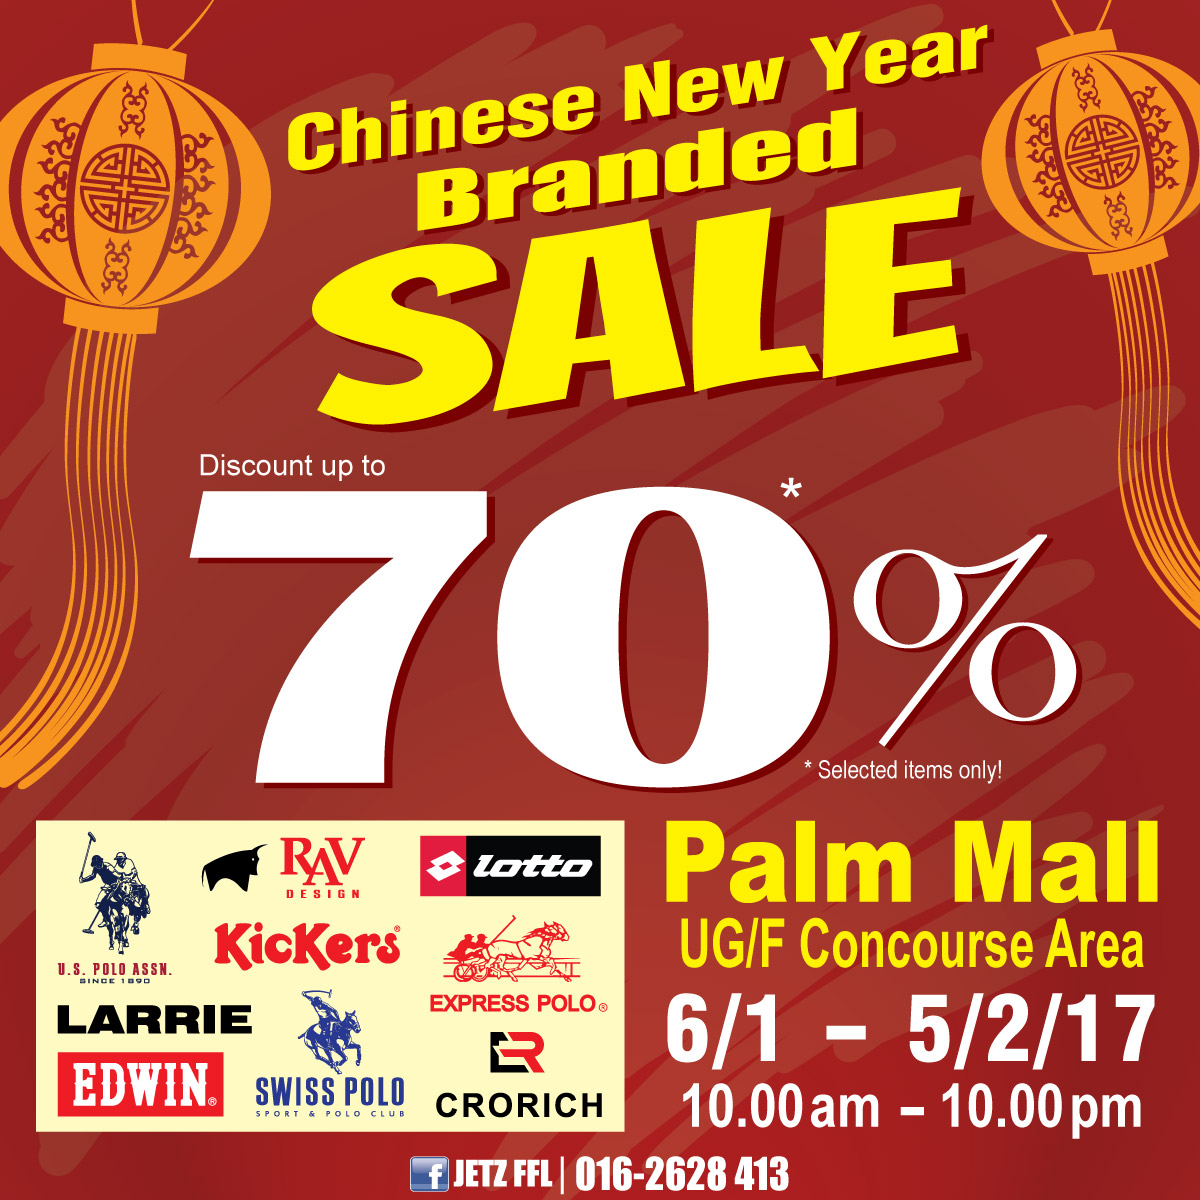 CNY Branded Sales